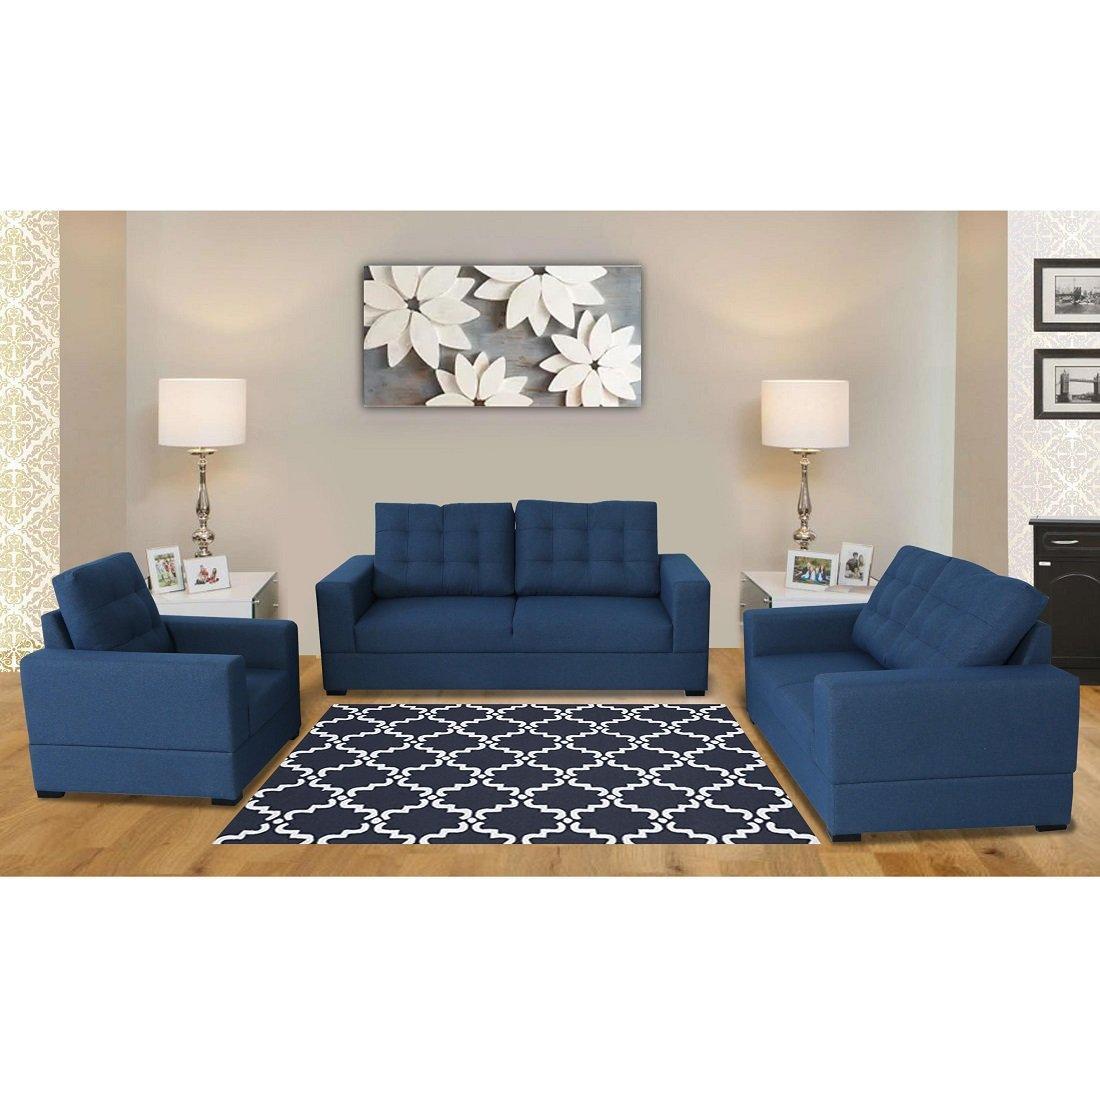 Buy Grafton Sofa Sets Of 3 2 1 In Blue Colour Evok